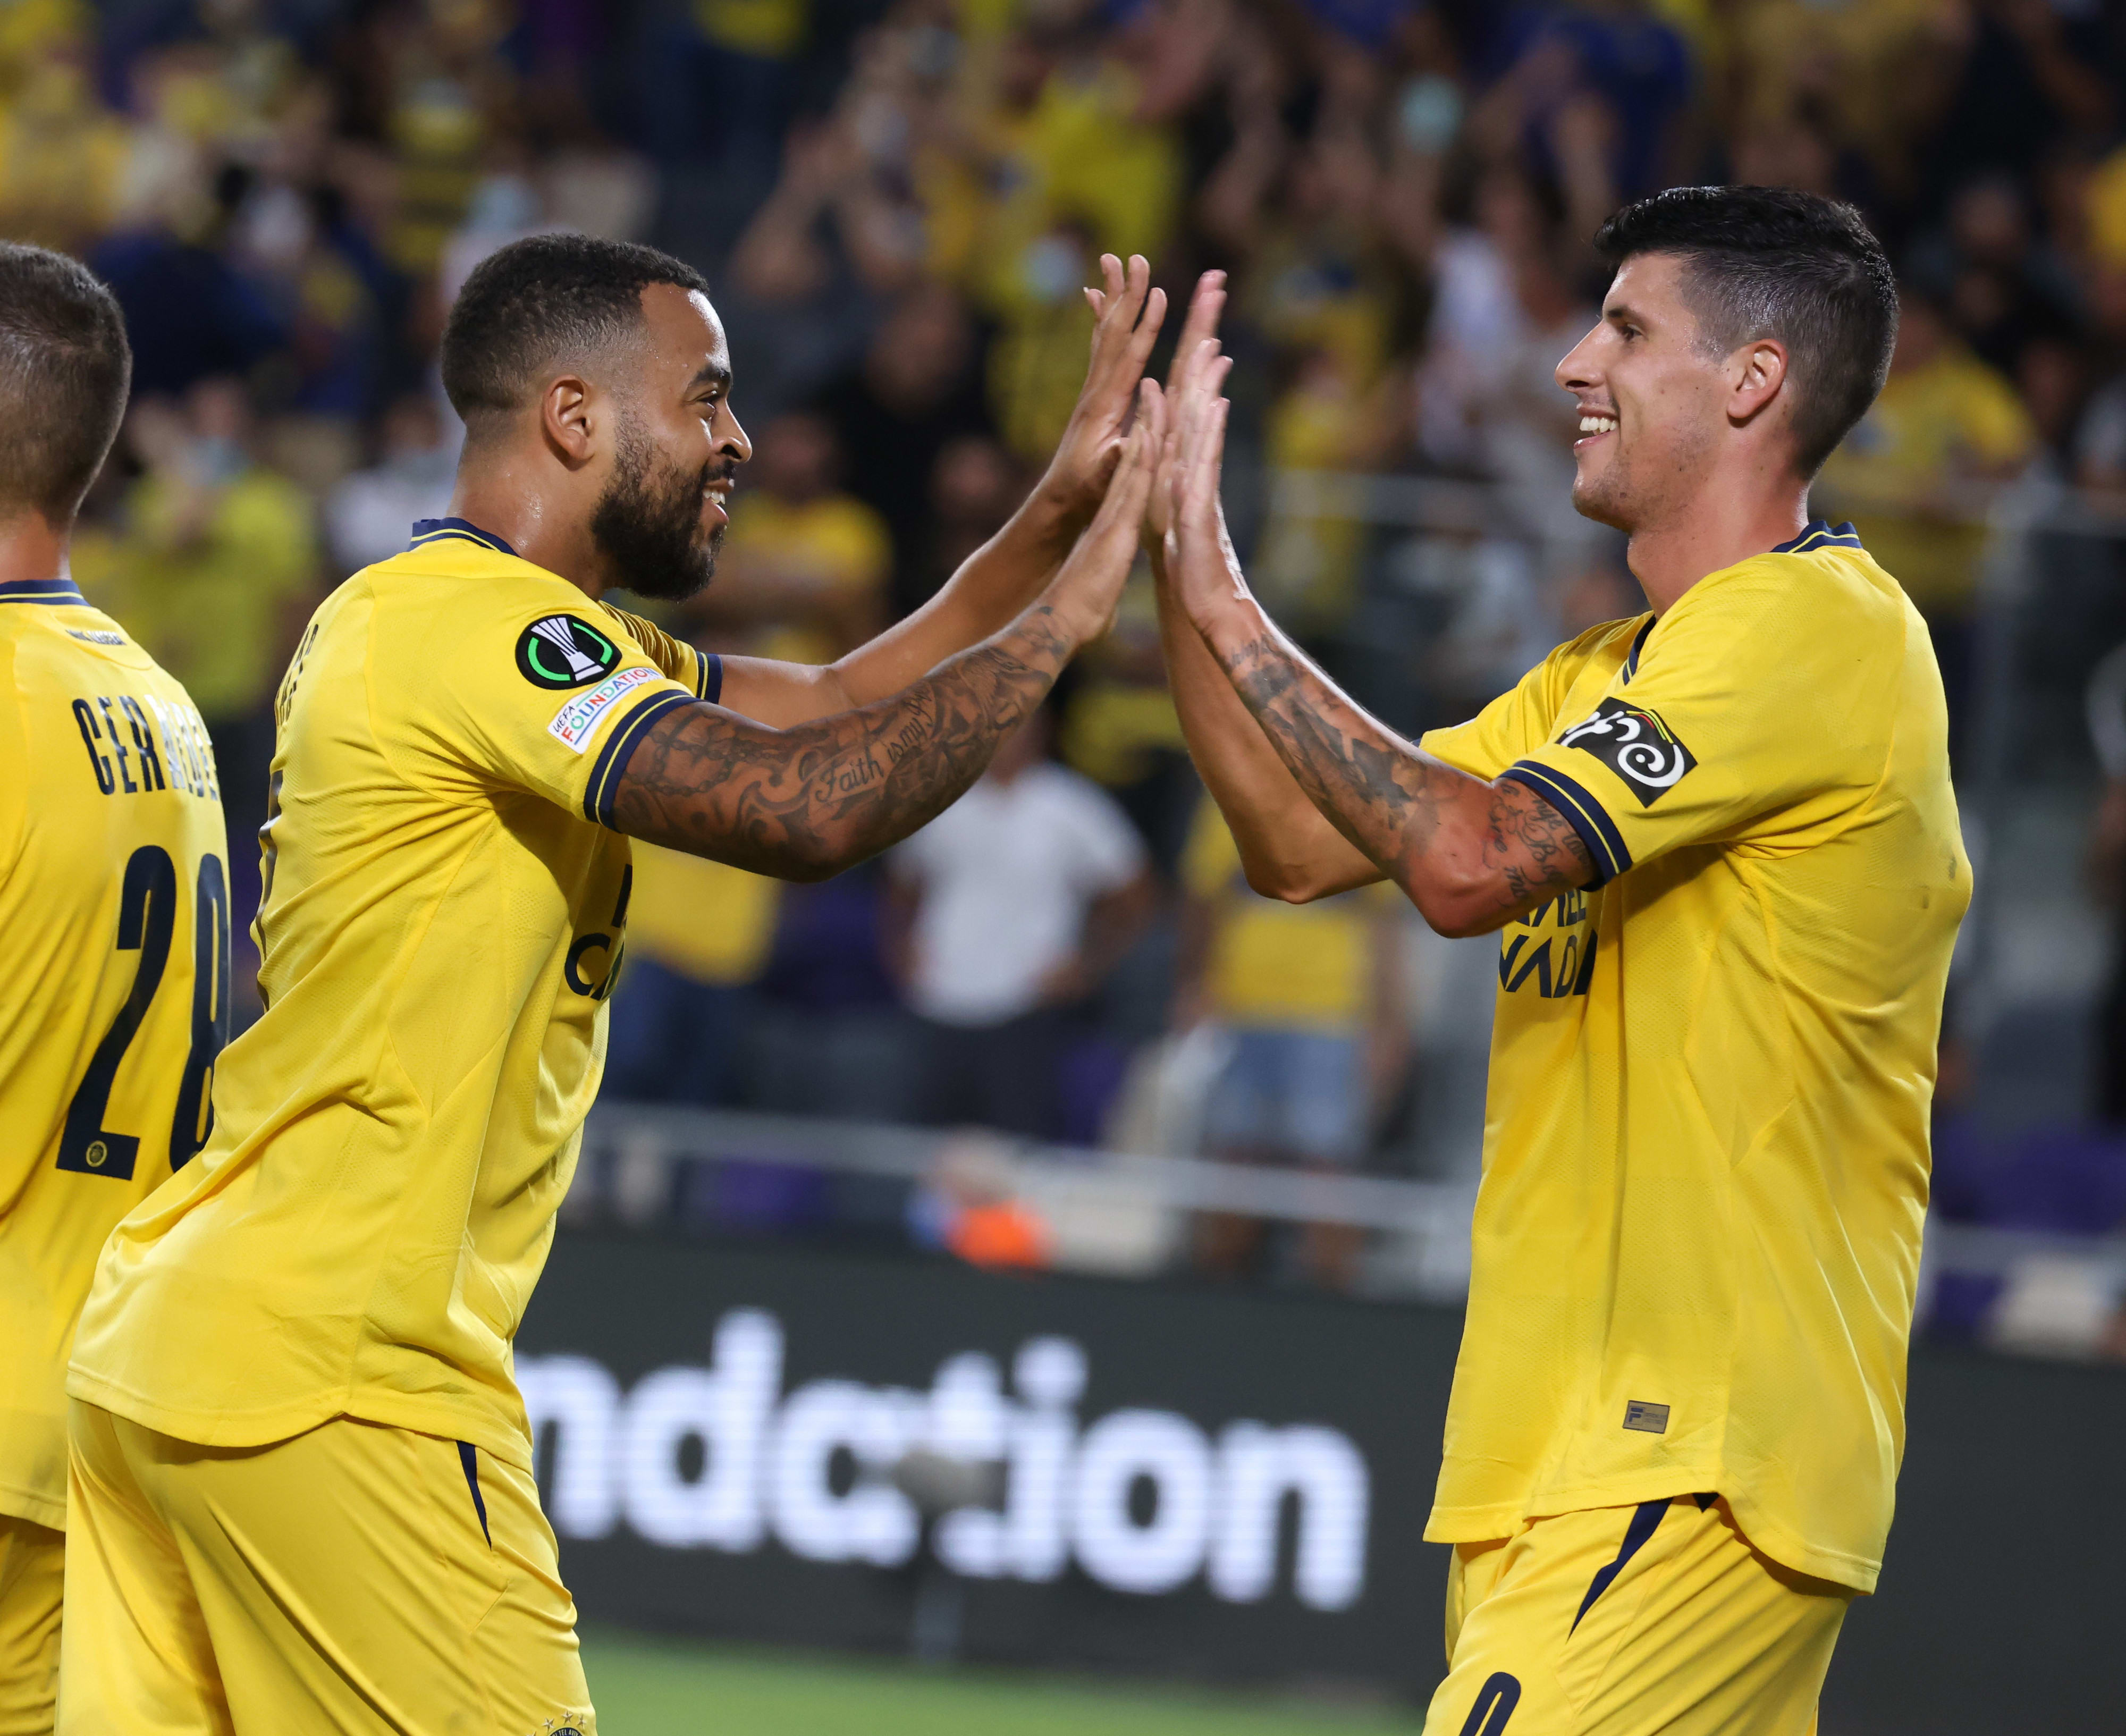 Maccabi Tel Aviv players Stifa Fritza, Brandley Kubas are celebrating